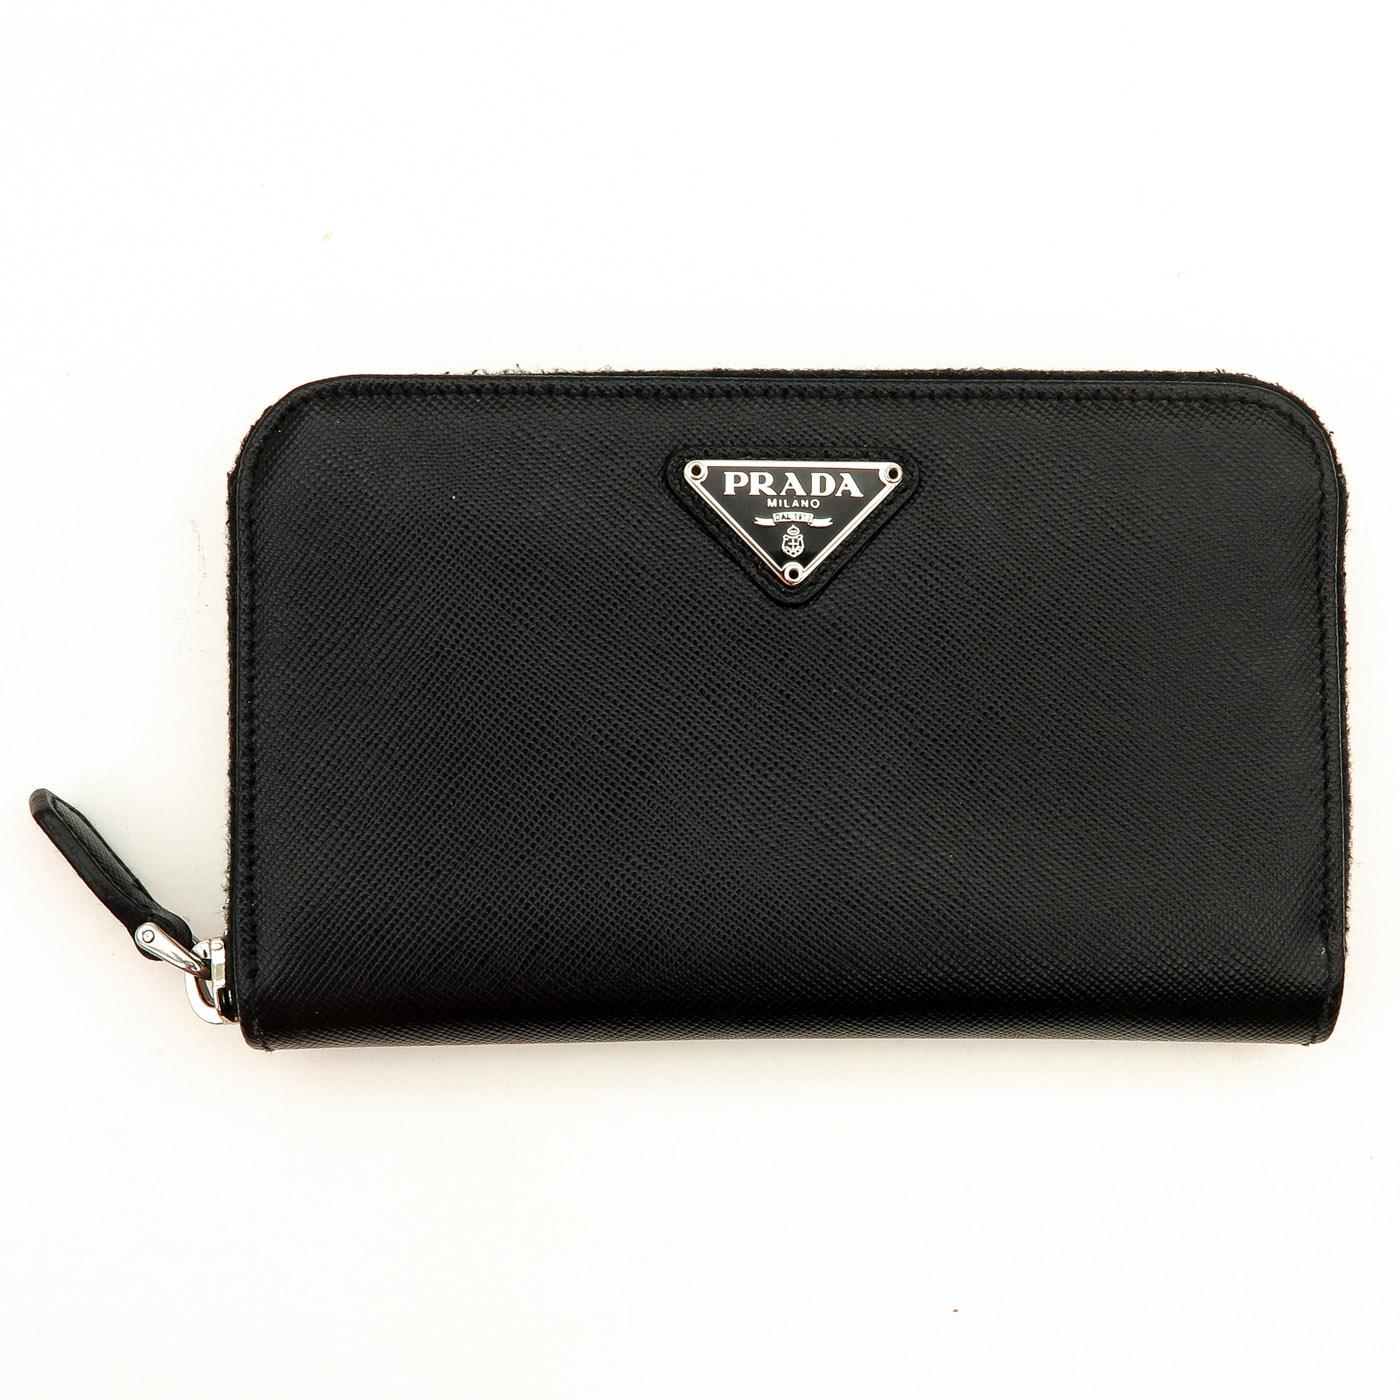 Lot 1274 - A Ladies Prada Wallet